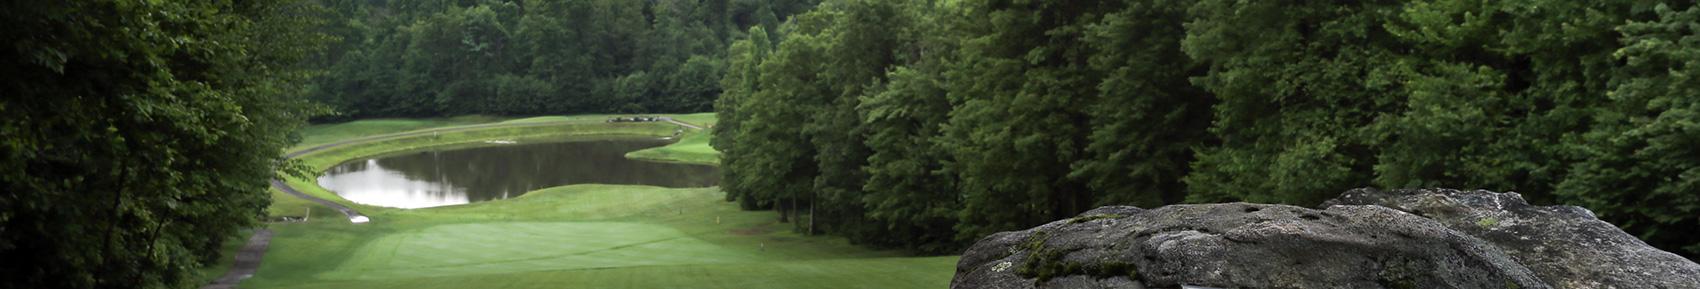 golf-fairway-scenic-1